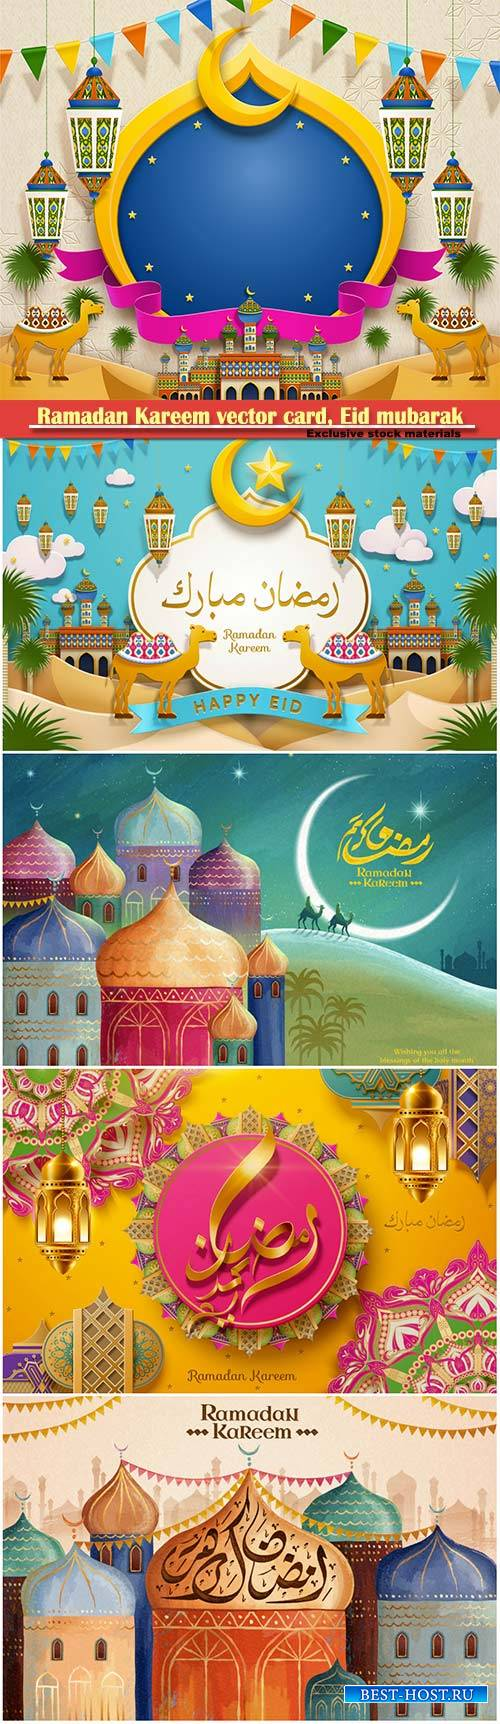 Ramadan Kareem vector card, Eid mubarak calligraphy design templates # 12